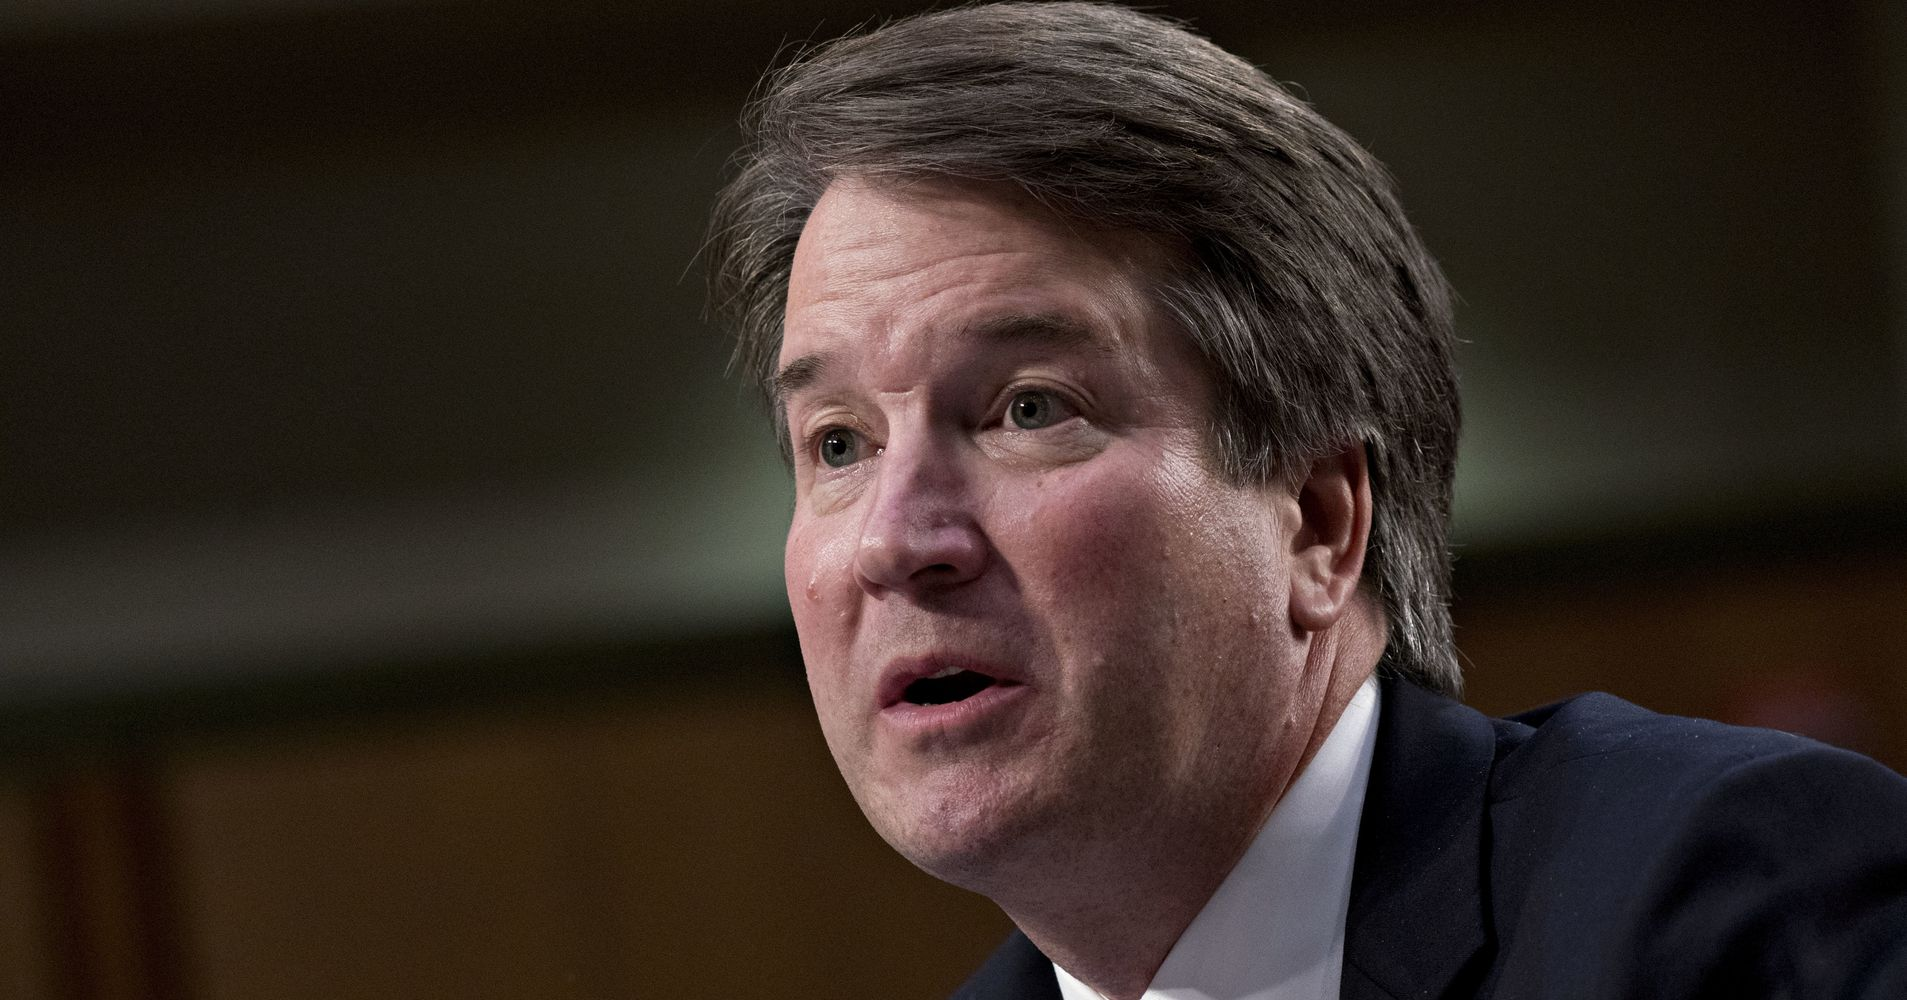 Kavanaugh's Choir Boy Defense Raises Questions About His Credibility, Democrats Say | HuffPost